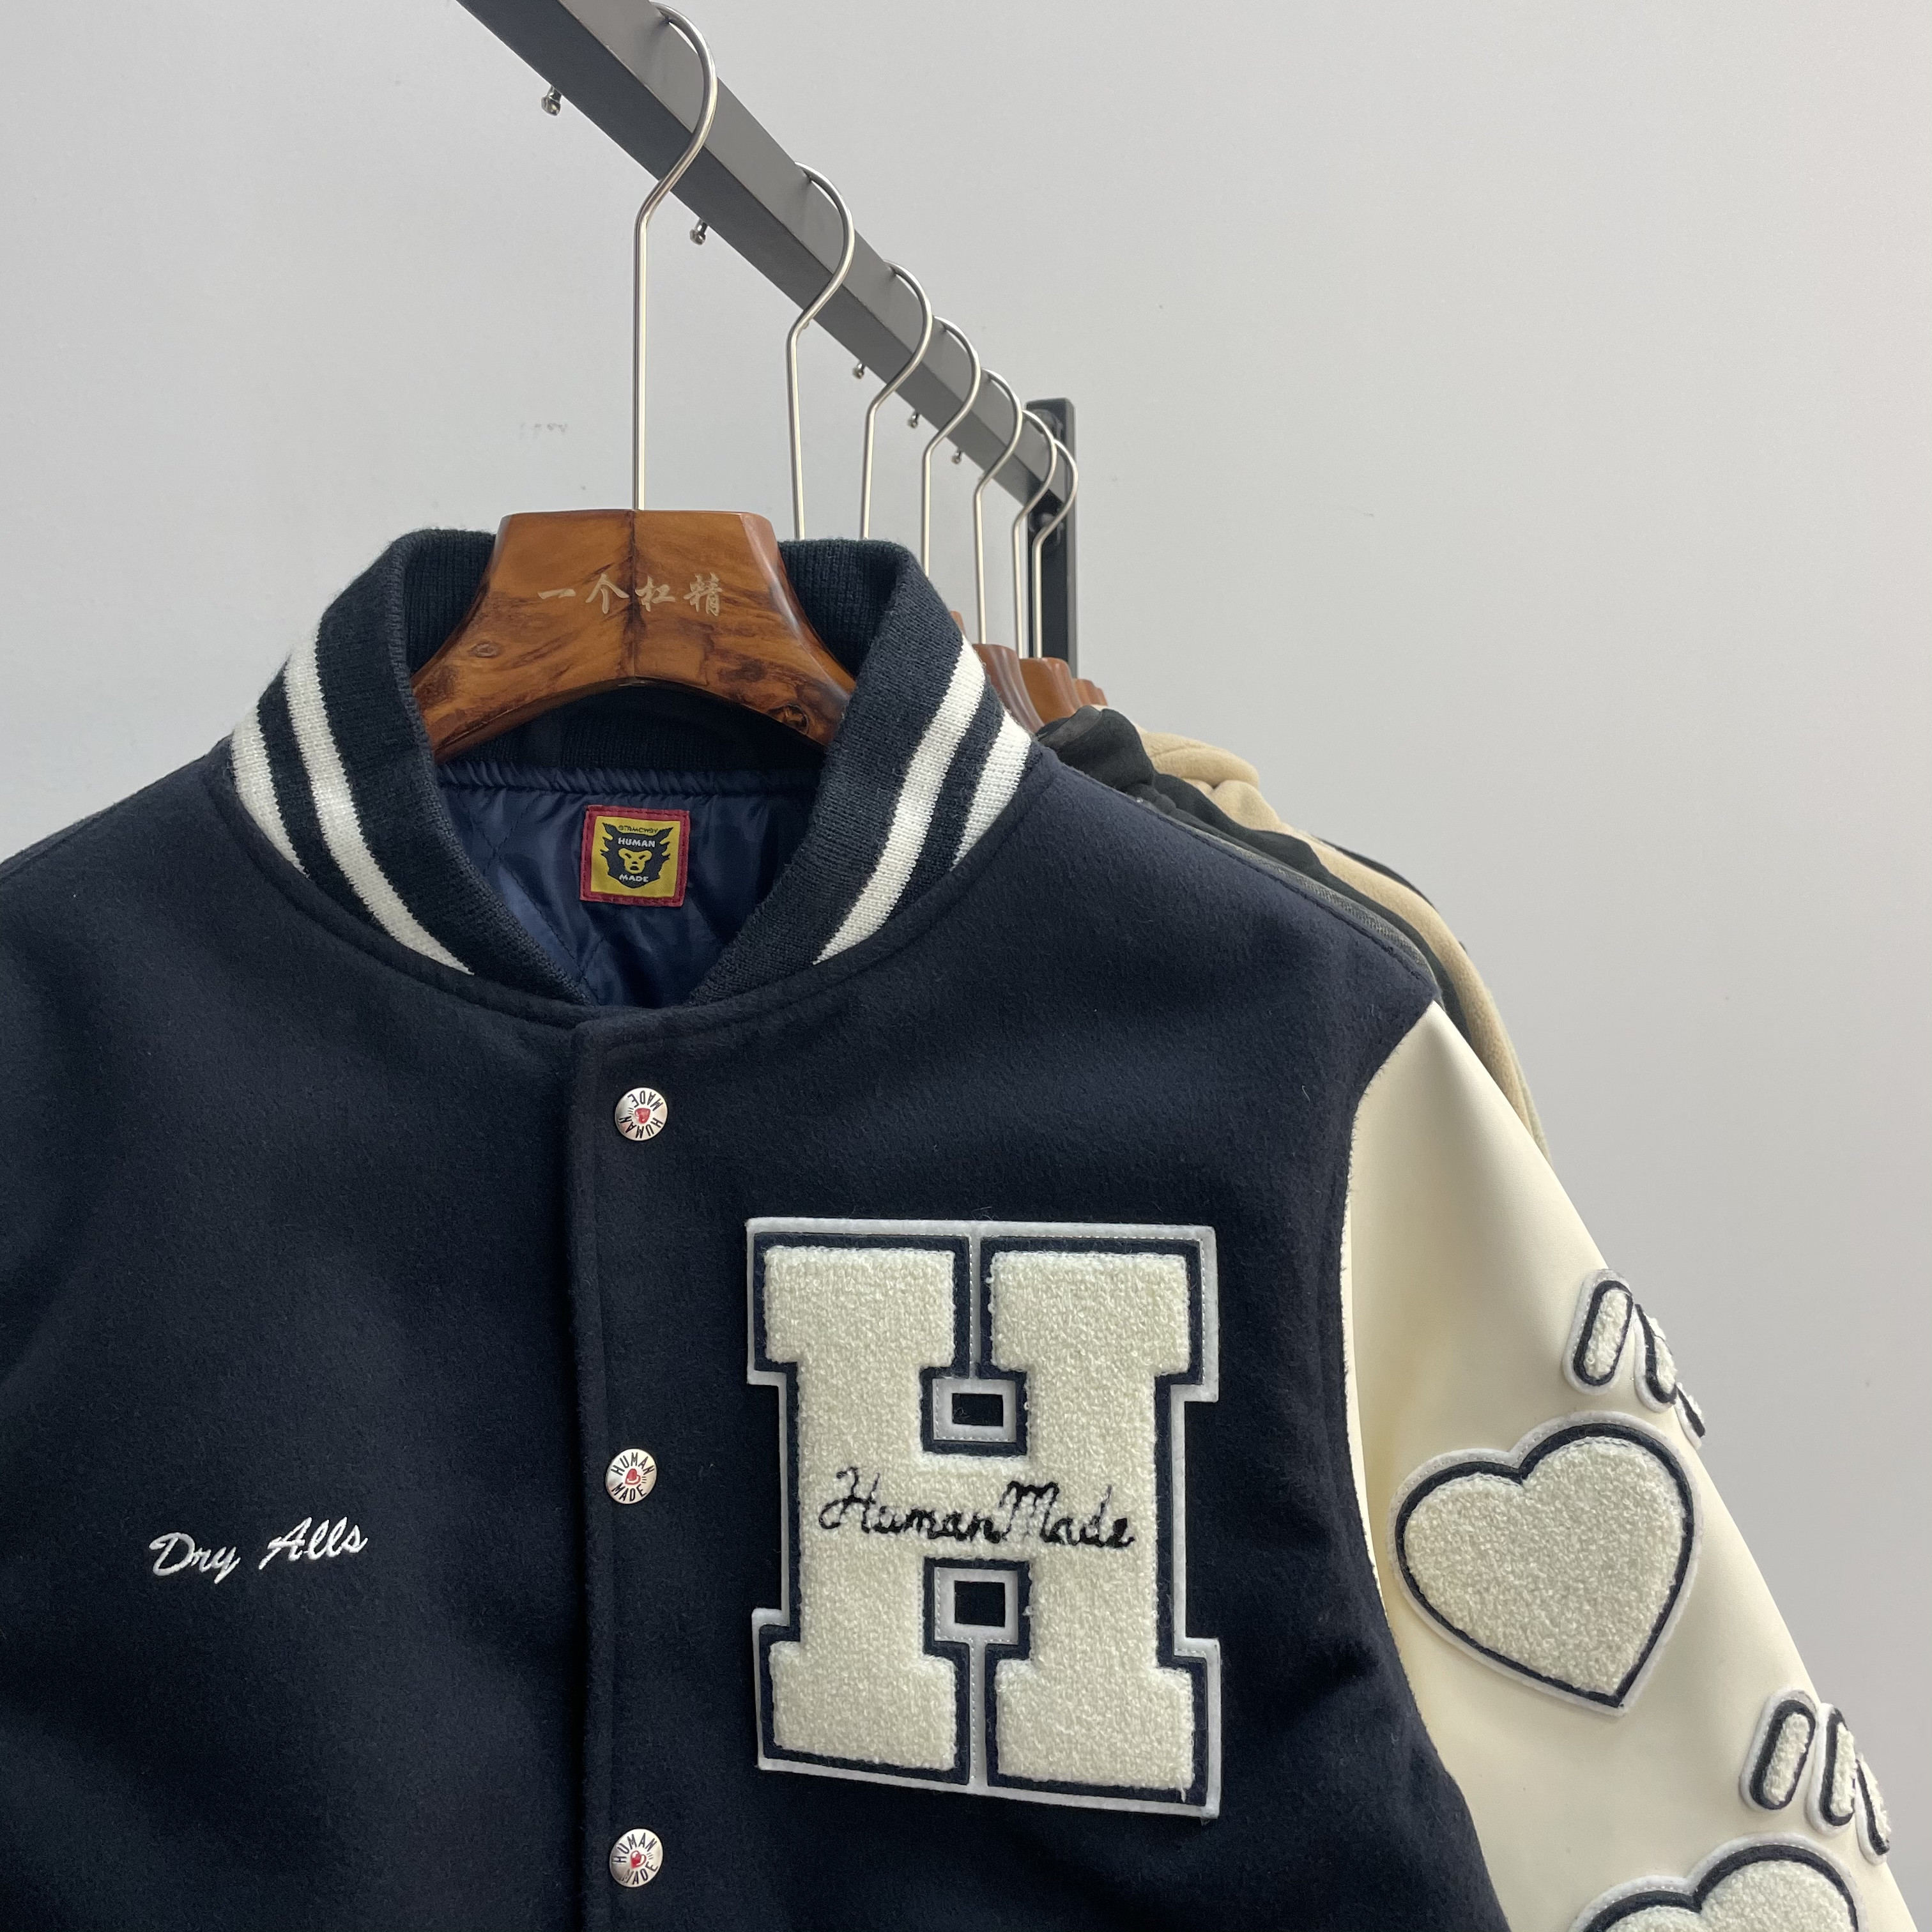 The correct version of Nigo Human Made autumn and winter new Mao Ni leather sleeve baseball jacket jacket men and women couples